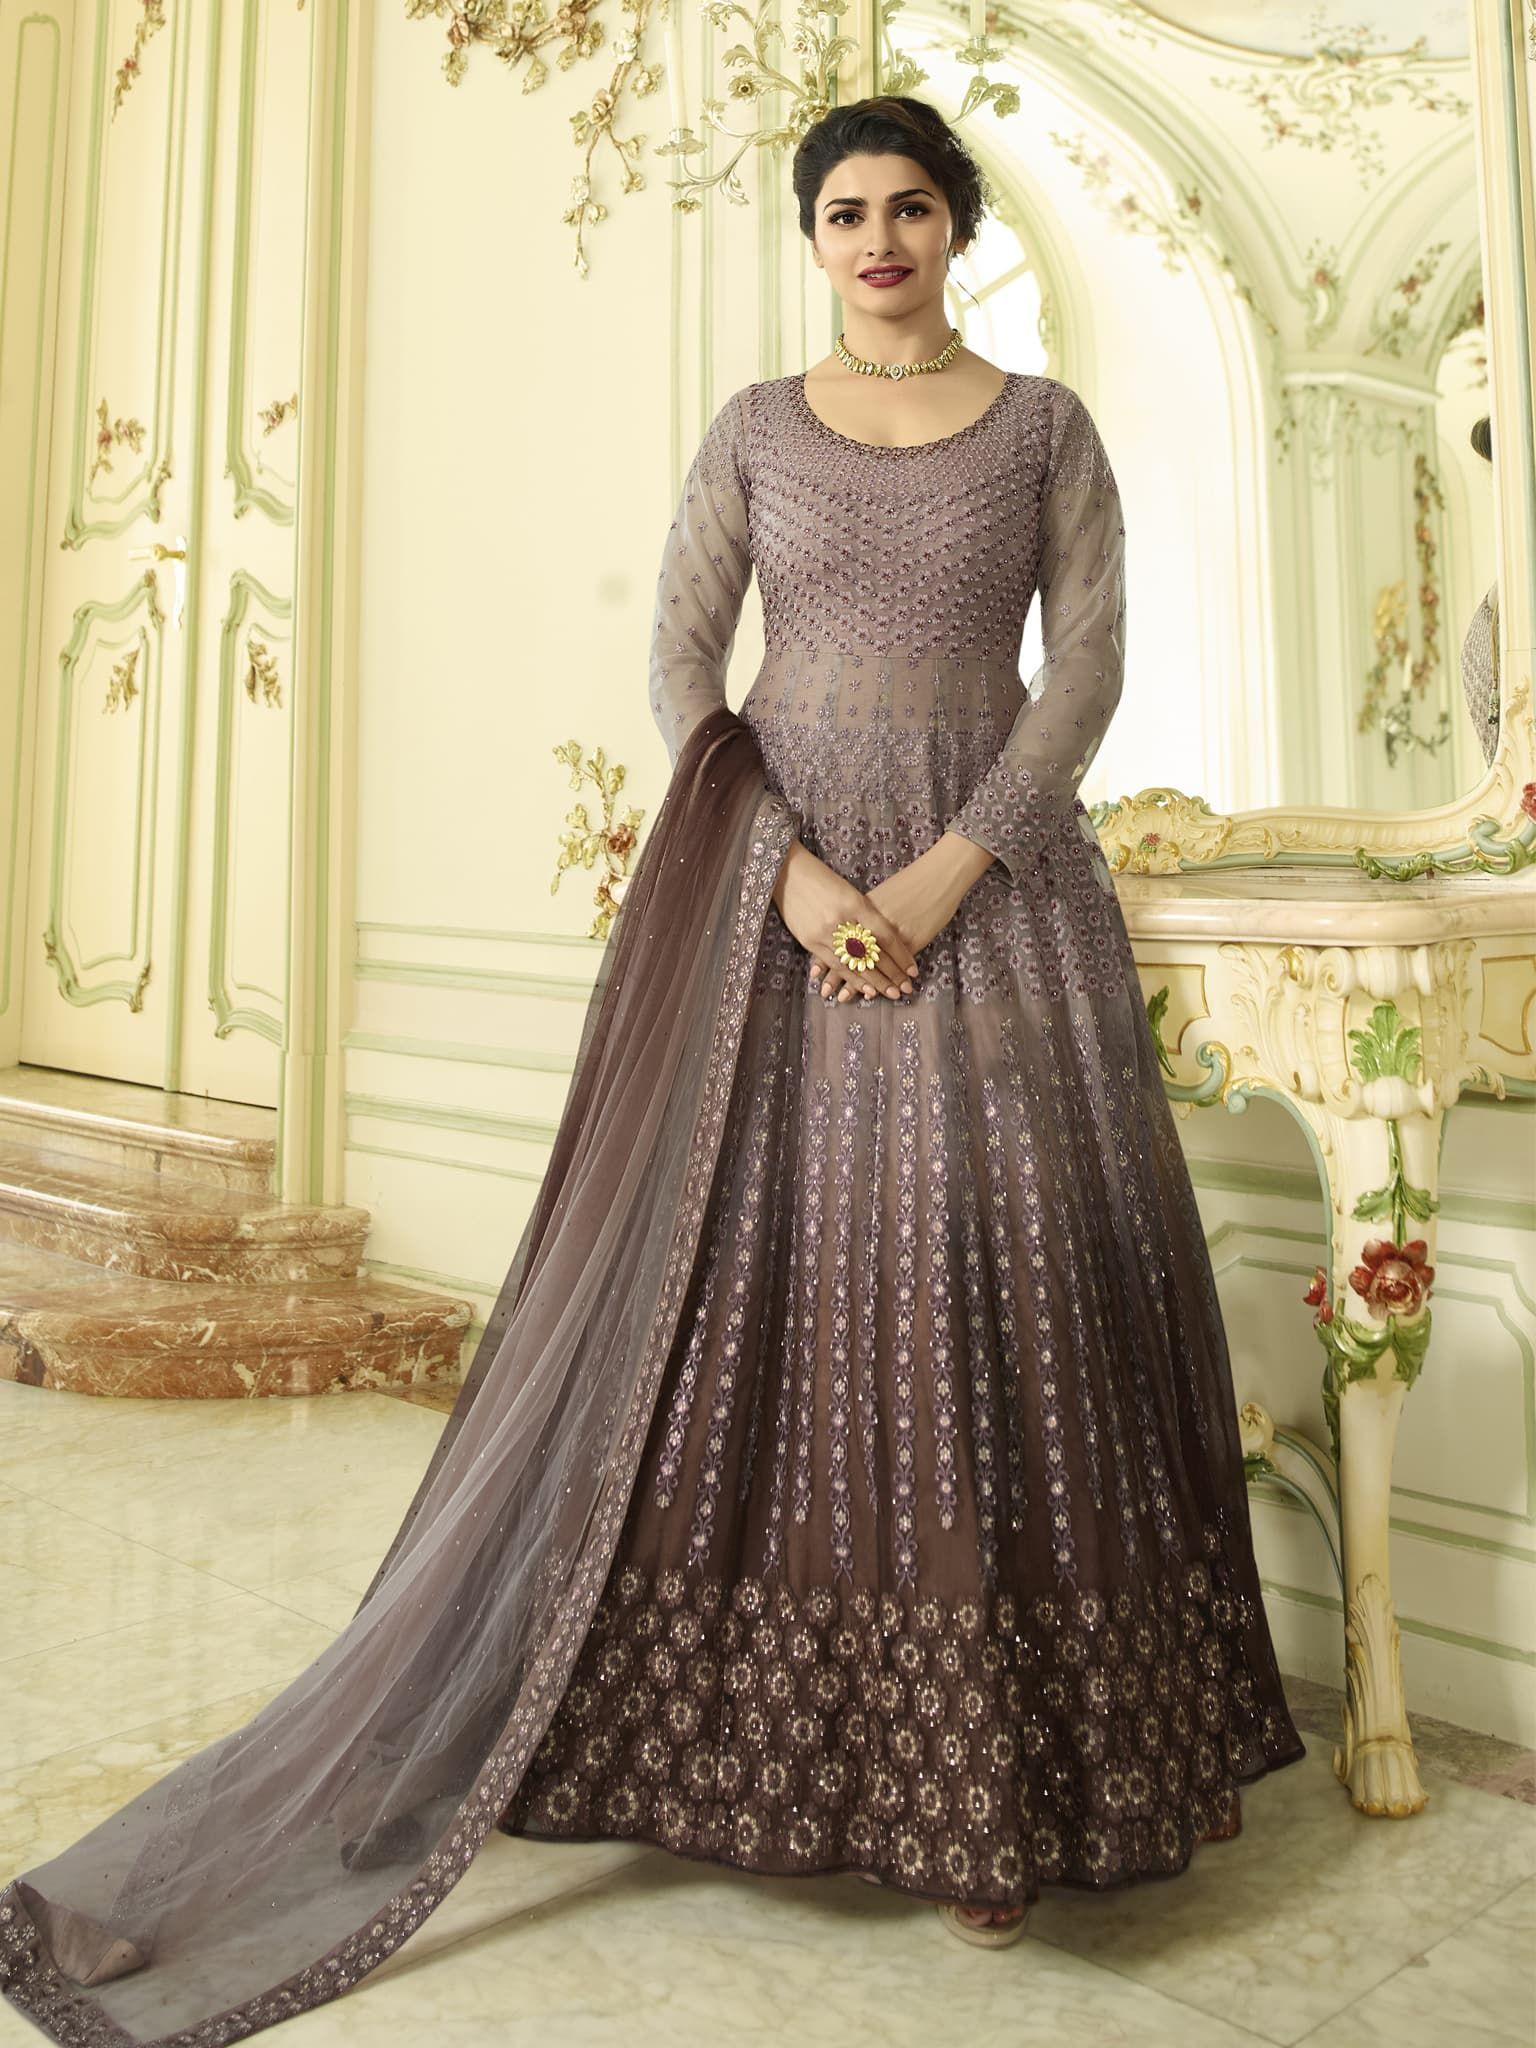 dd078b2de1 Onion Pink & Brown Color Net Fabric Semi Stitch Dress Material ...